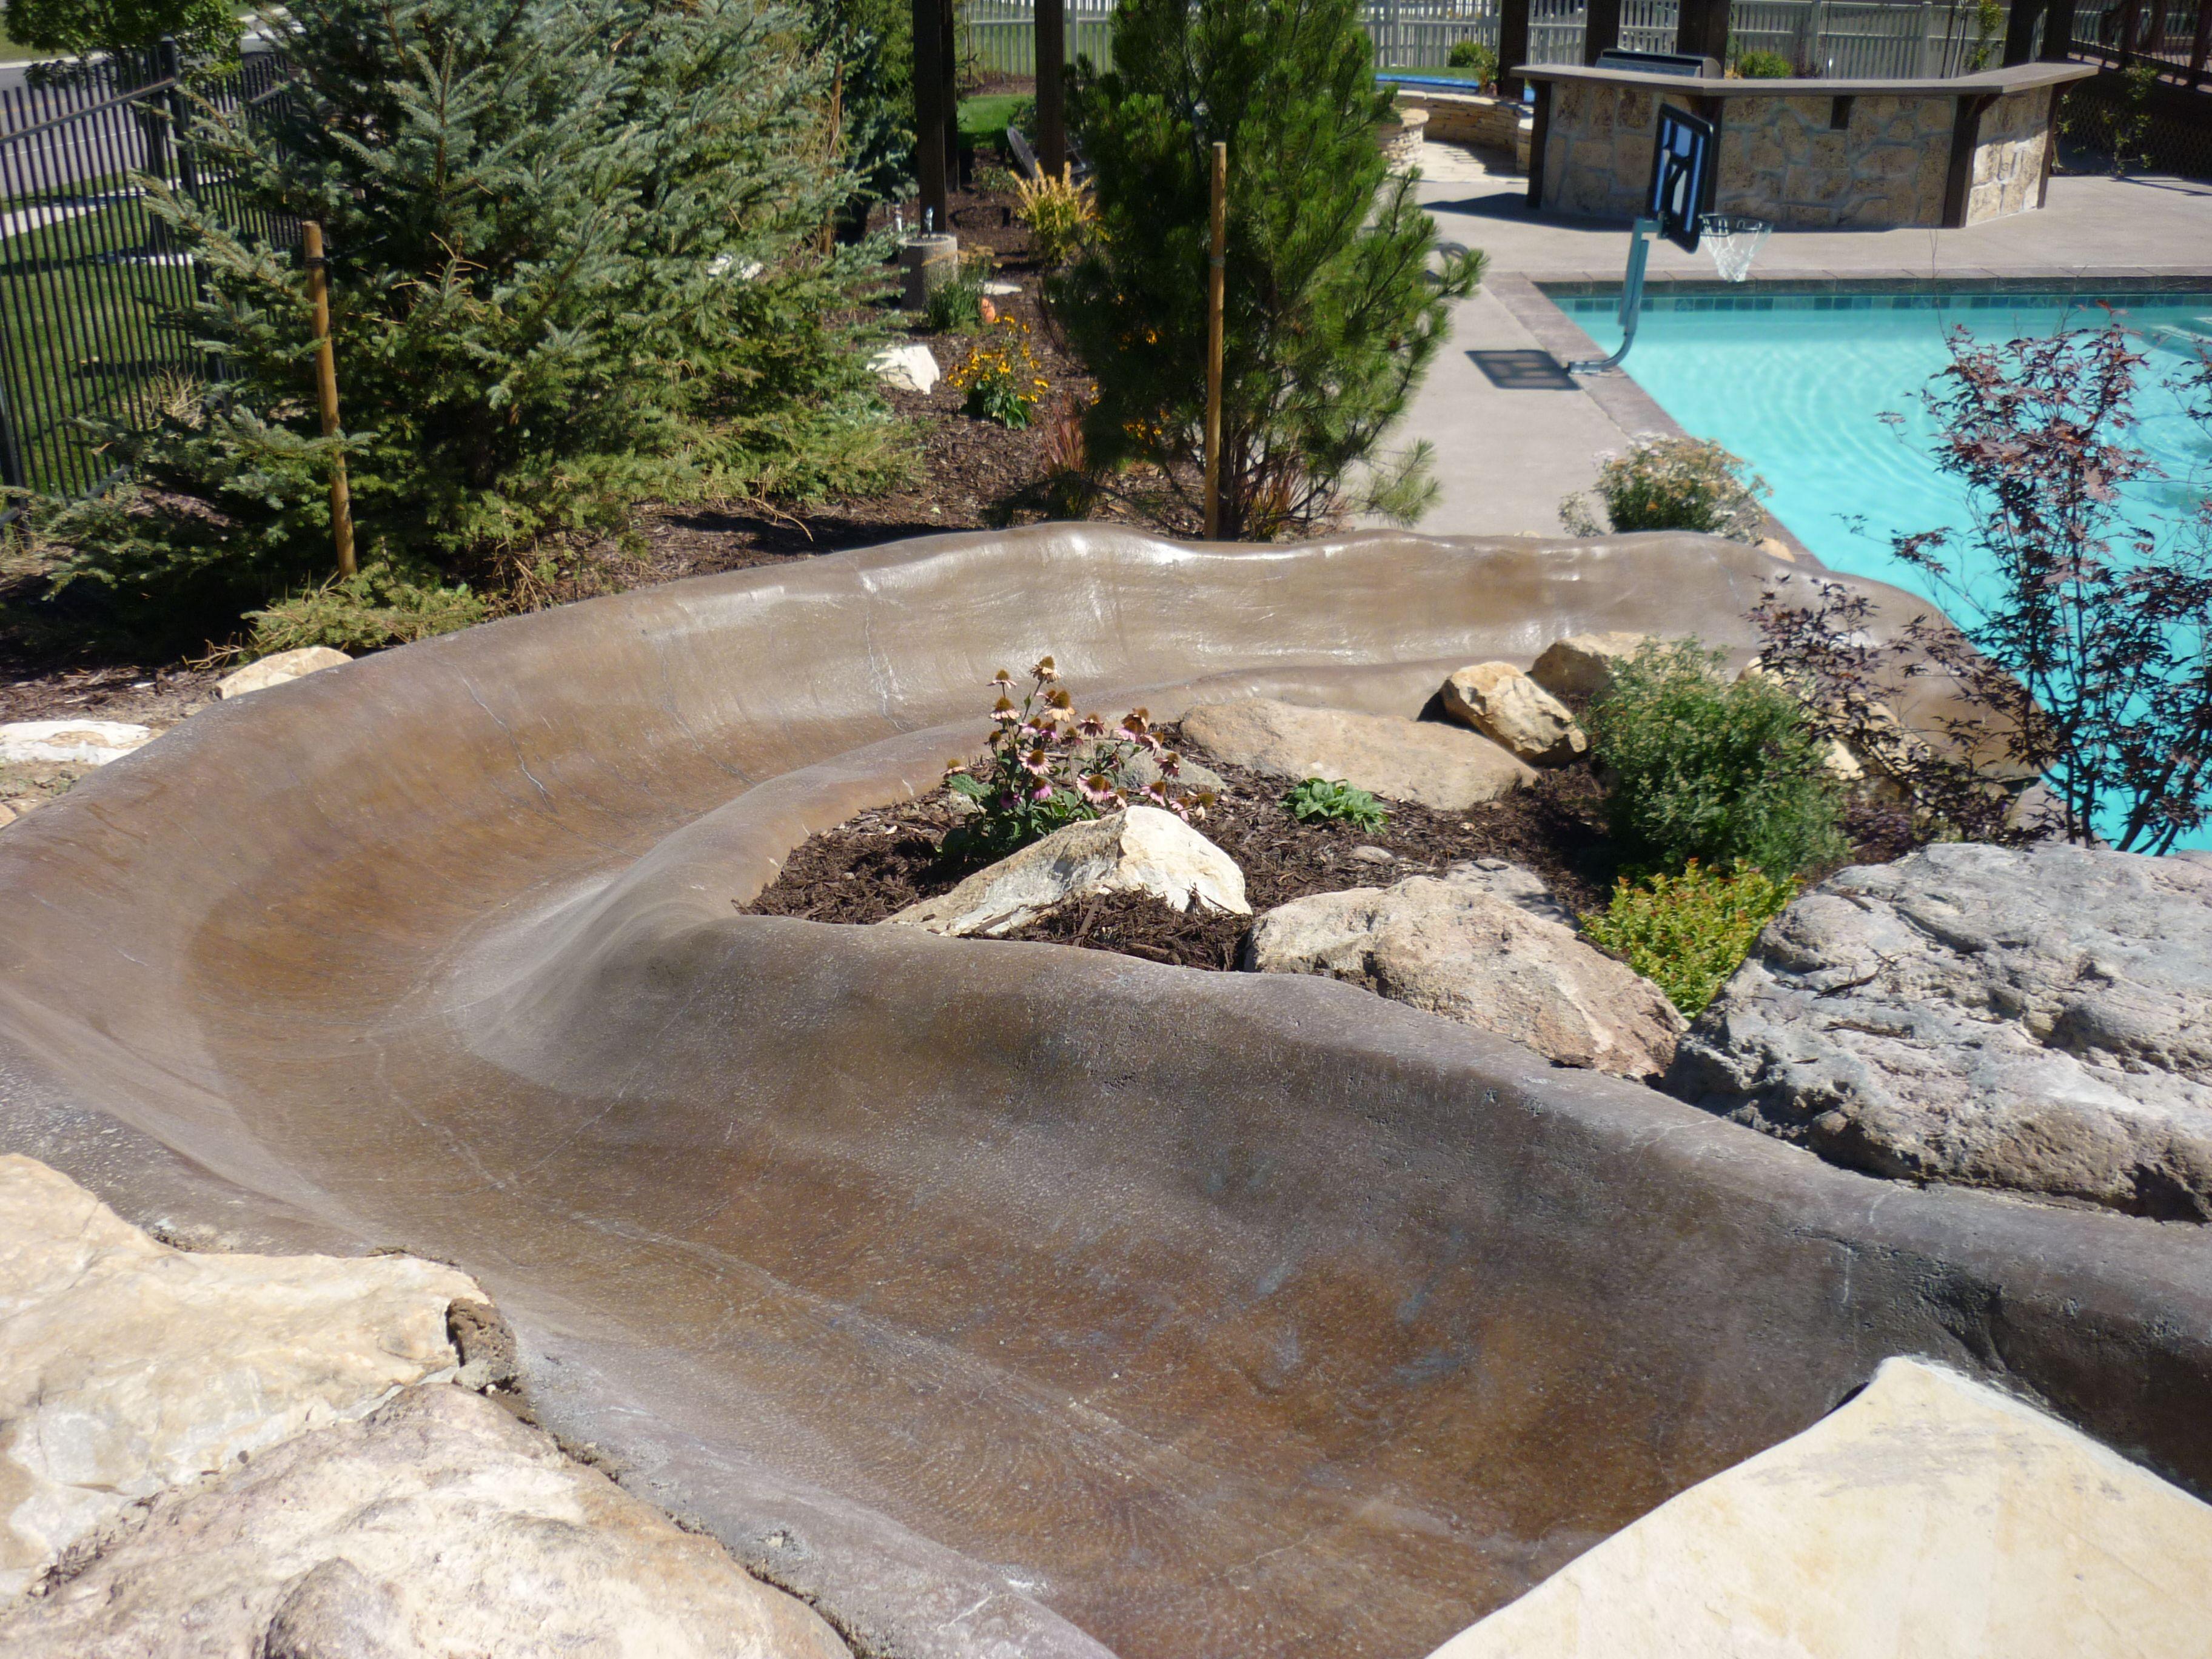 Pool Designs With Rock Slides natural pool attractions Gunite Pool Slide More